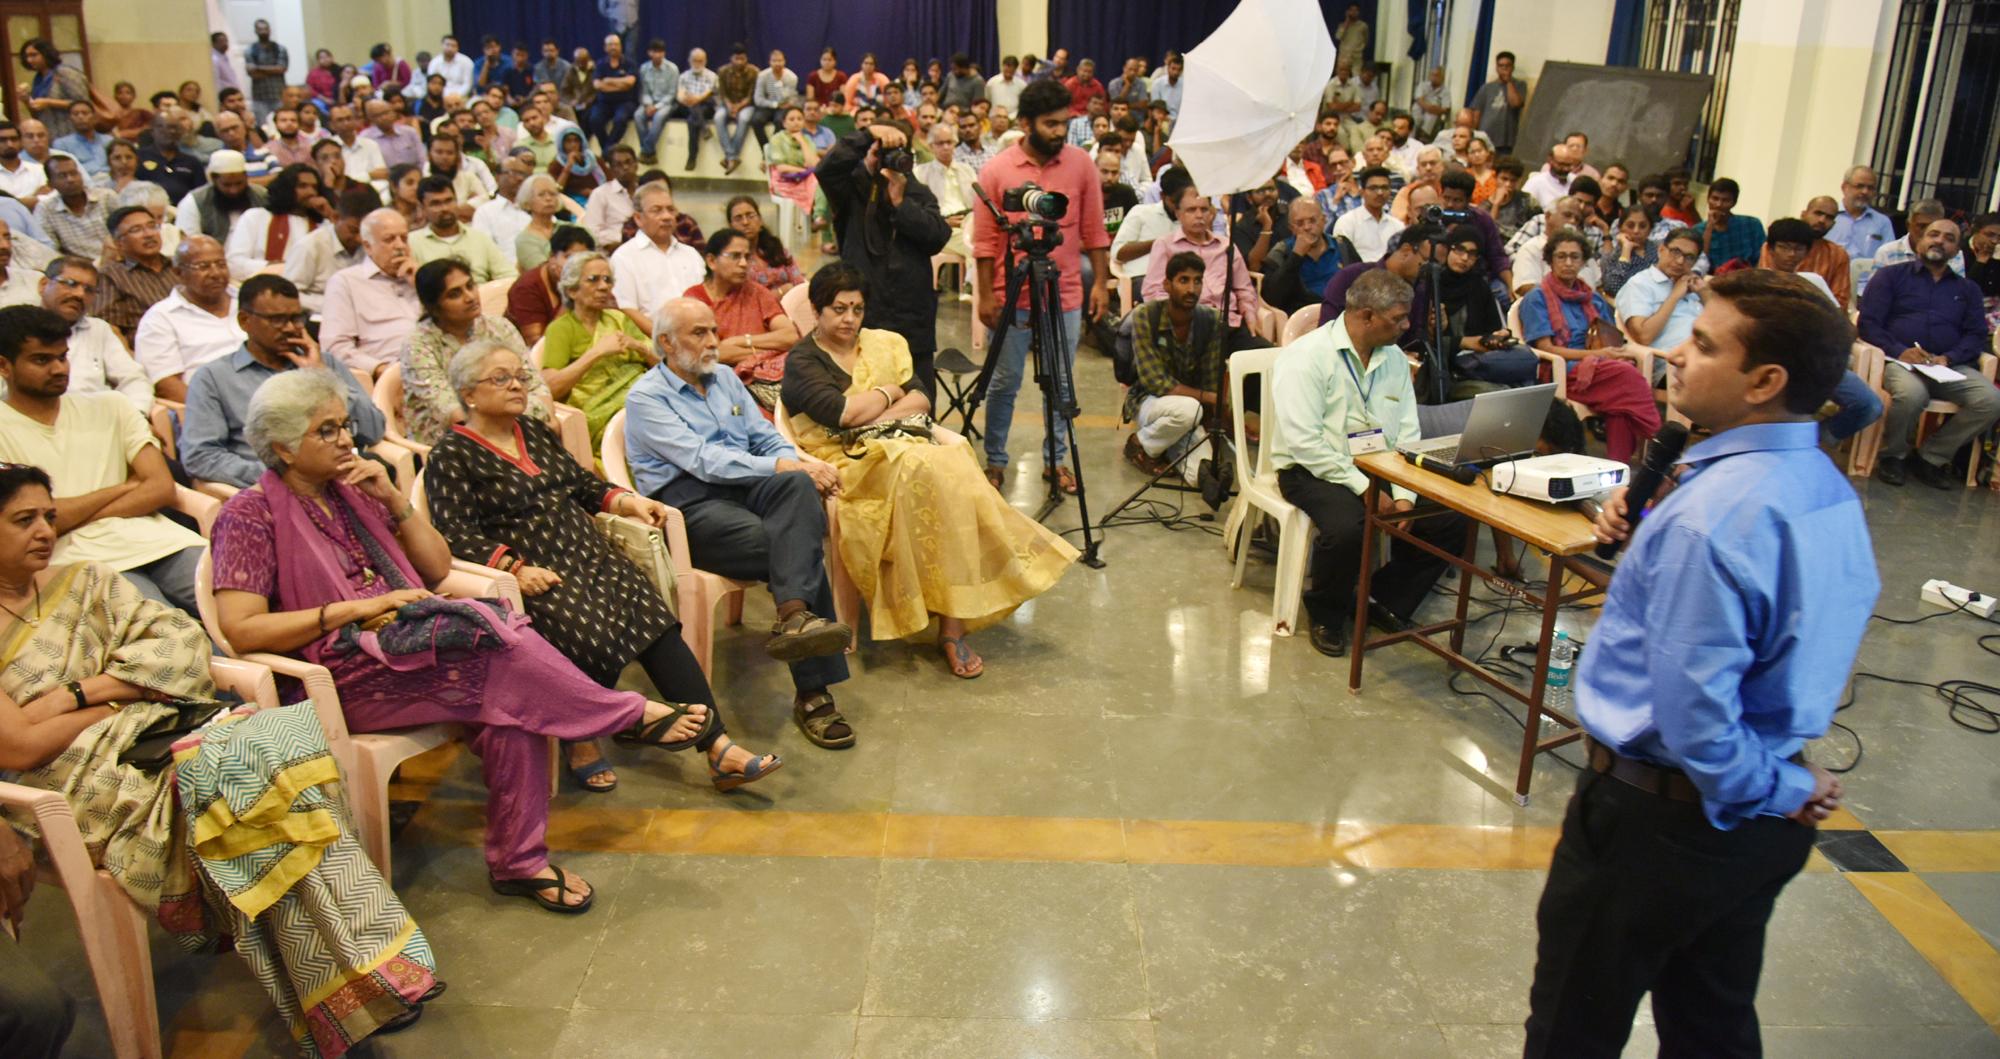 Hyderabad News: Latest Hyderabad City News, Hyderabad News Today